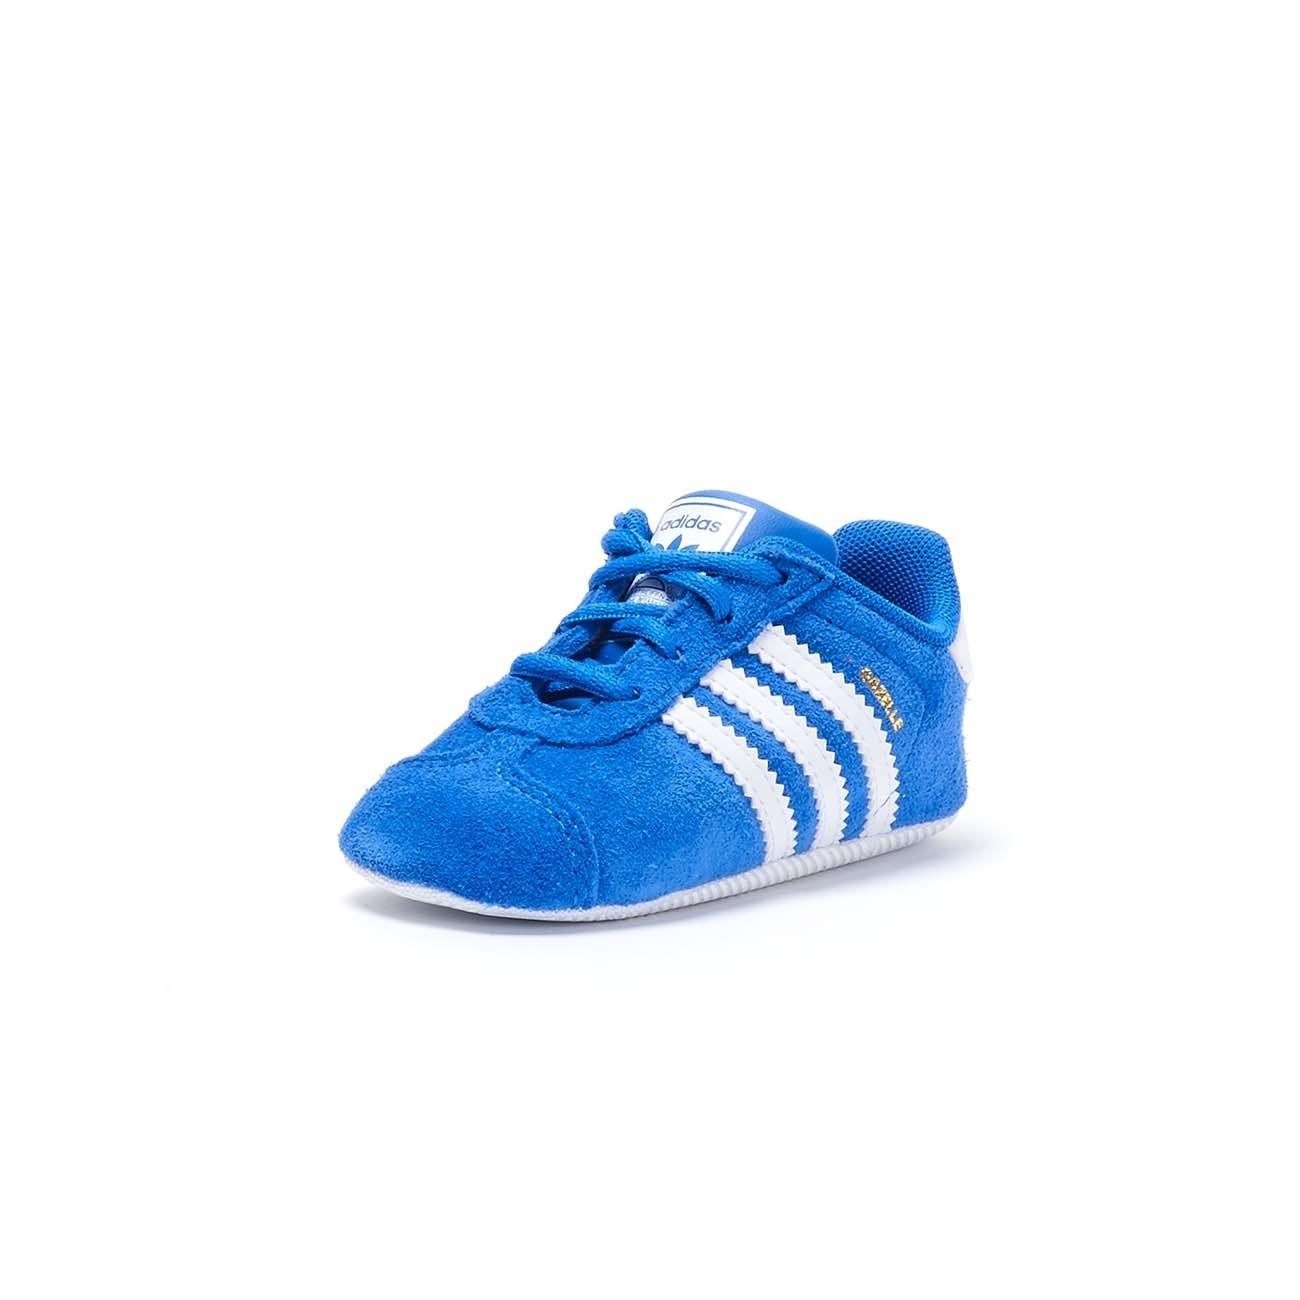 ADIDAS GAZELLE CRIB SNEAKERS Baby Blue white | Mascheroni Sportswear